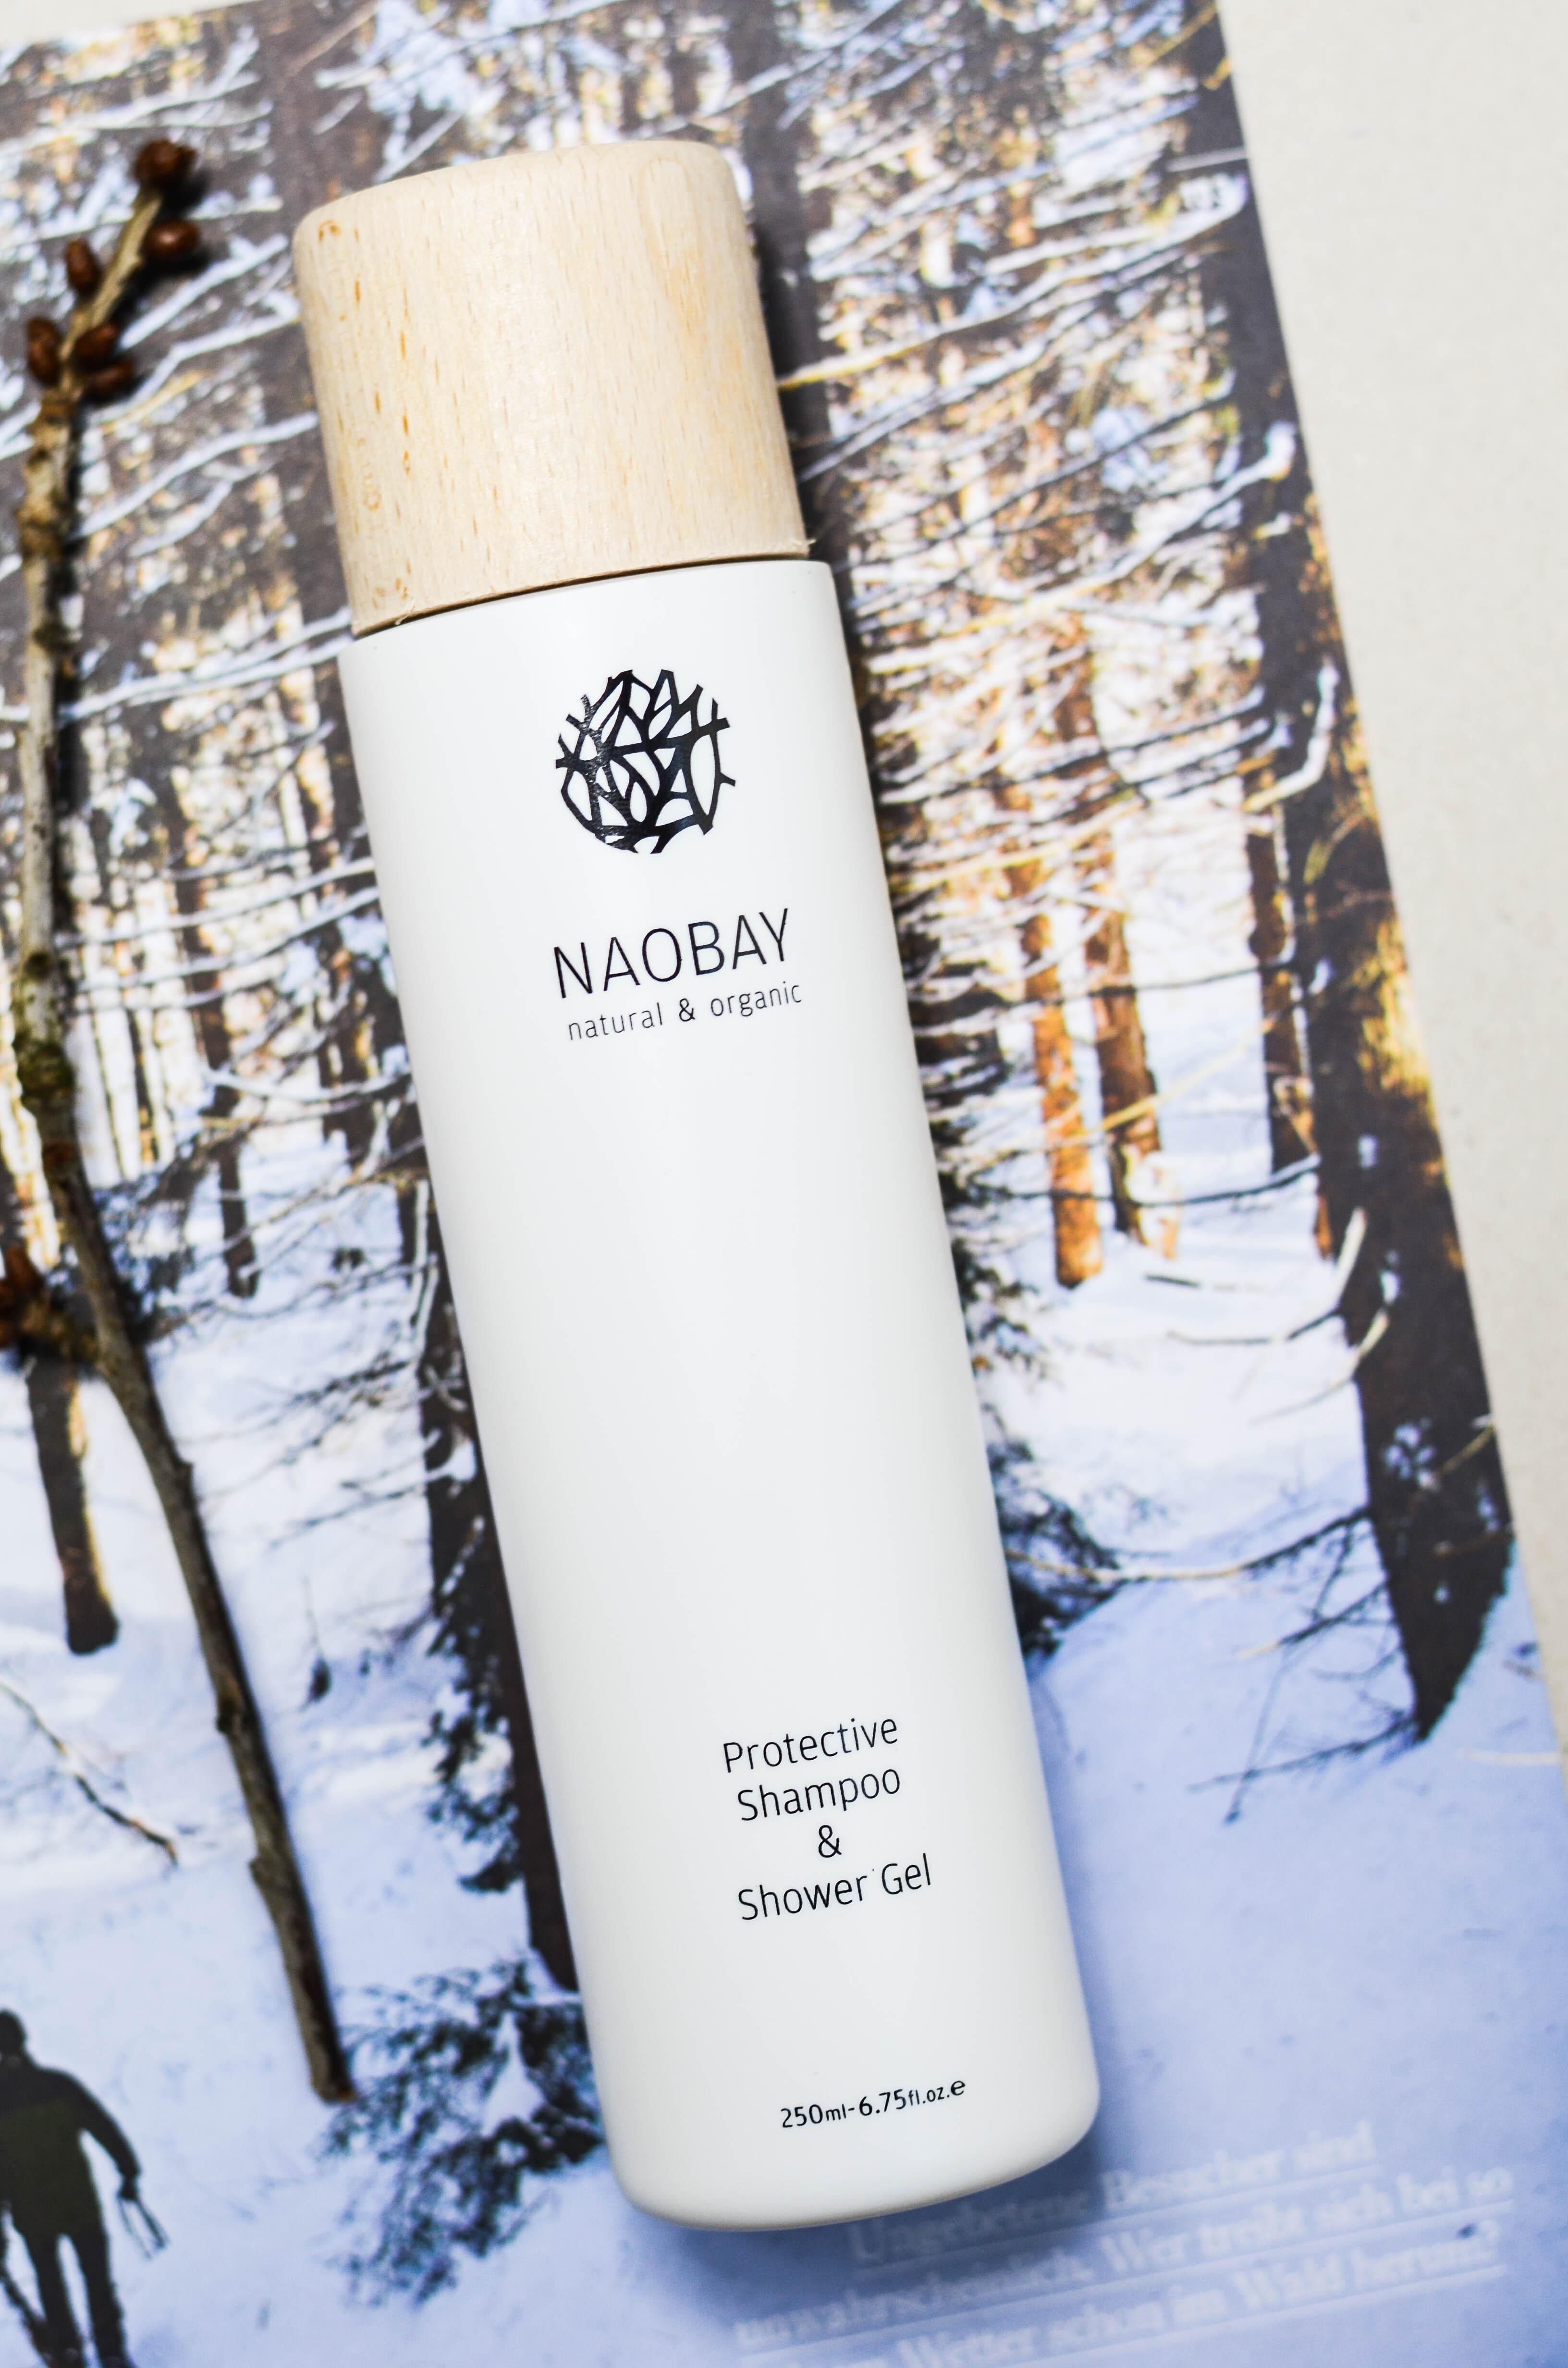 Naturkosmetik Shampoo von Naobay